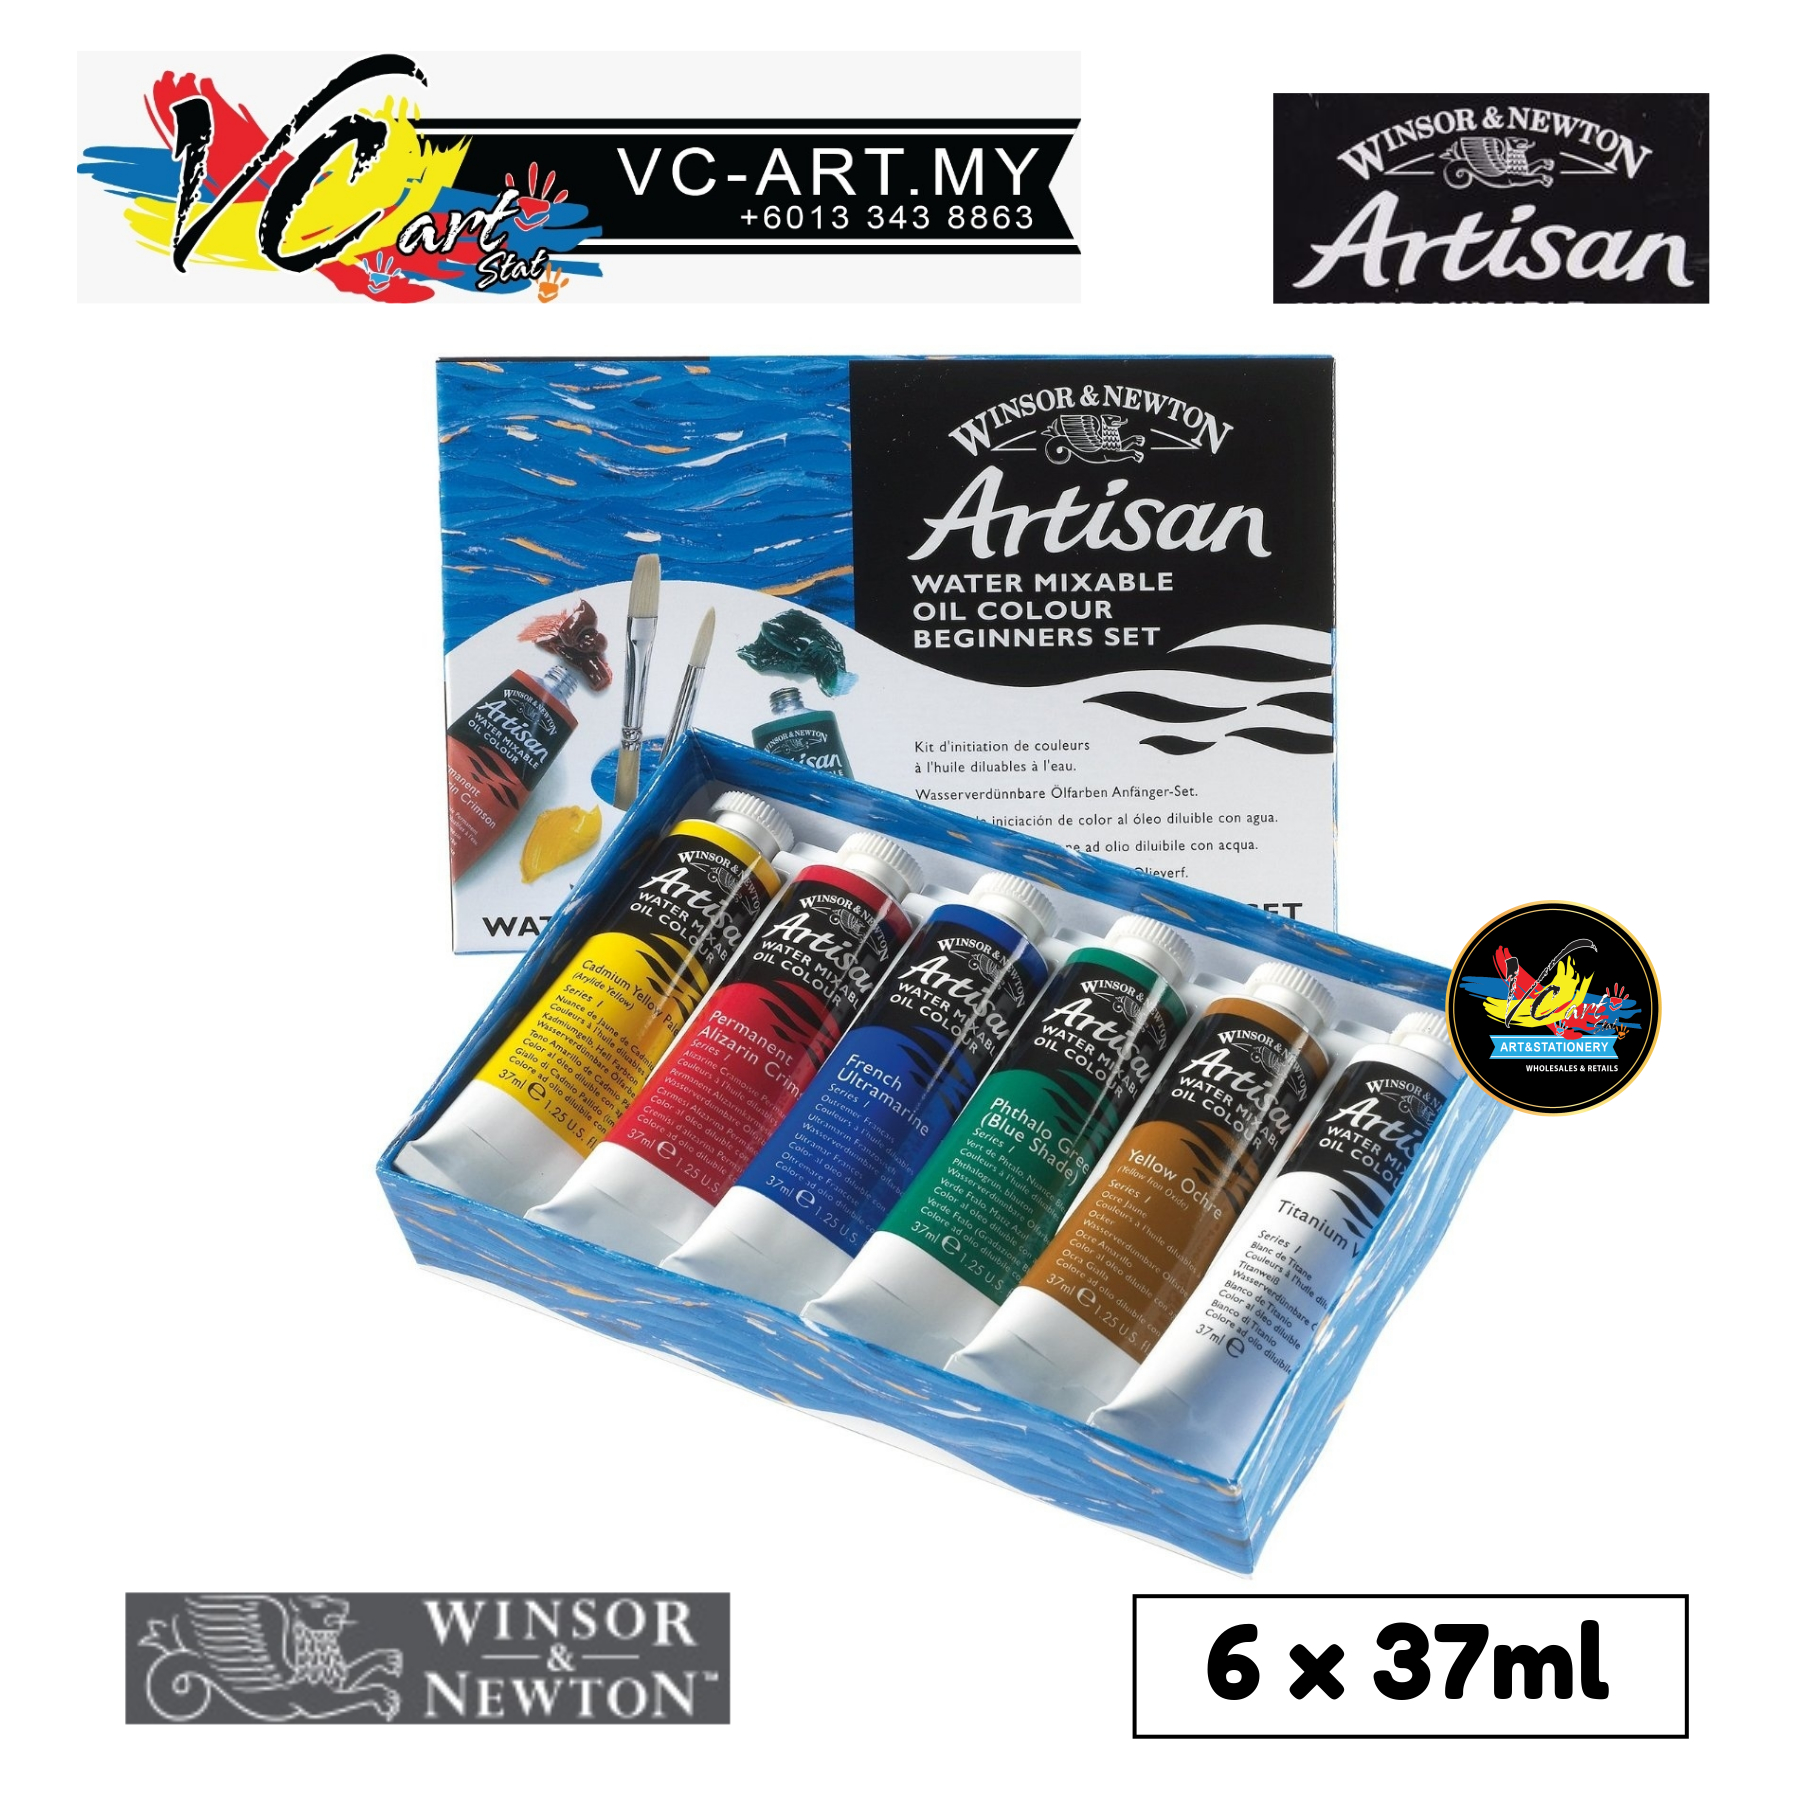 661195596d62 Winsor   Newton Artisan Water Mixabl (end 9 21 2020 2 36 PM)